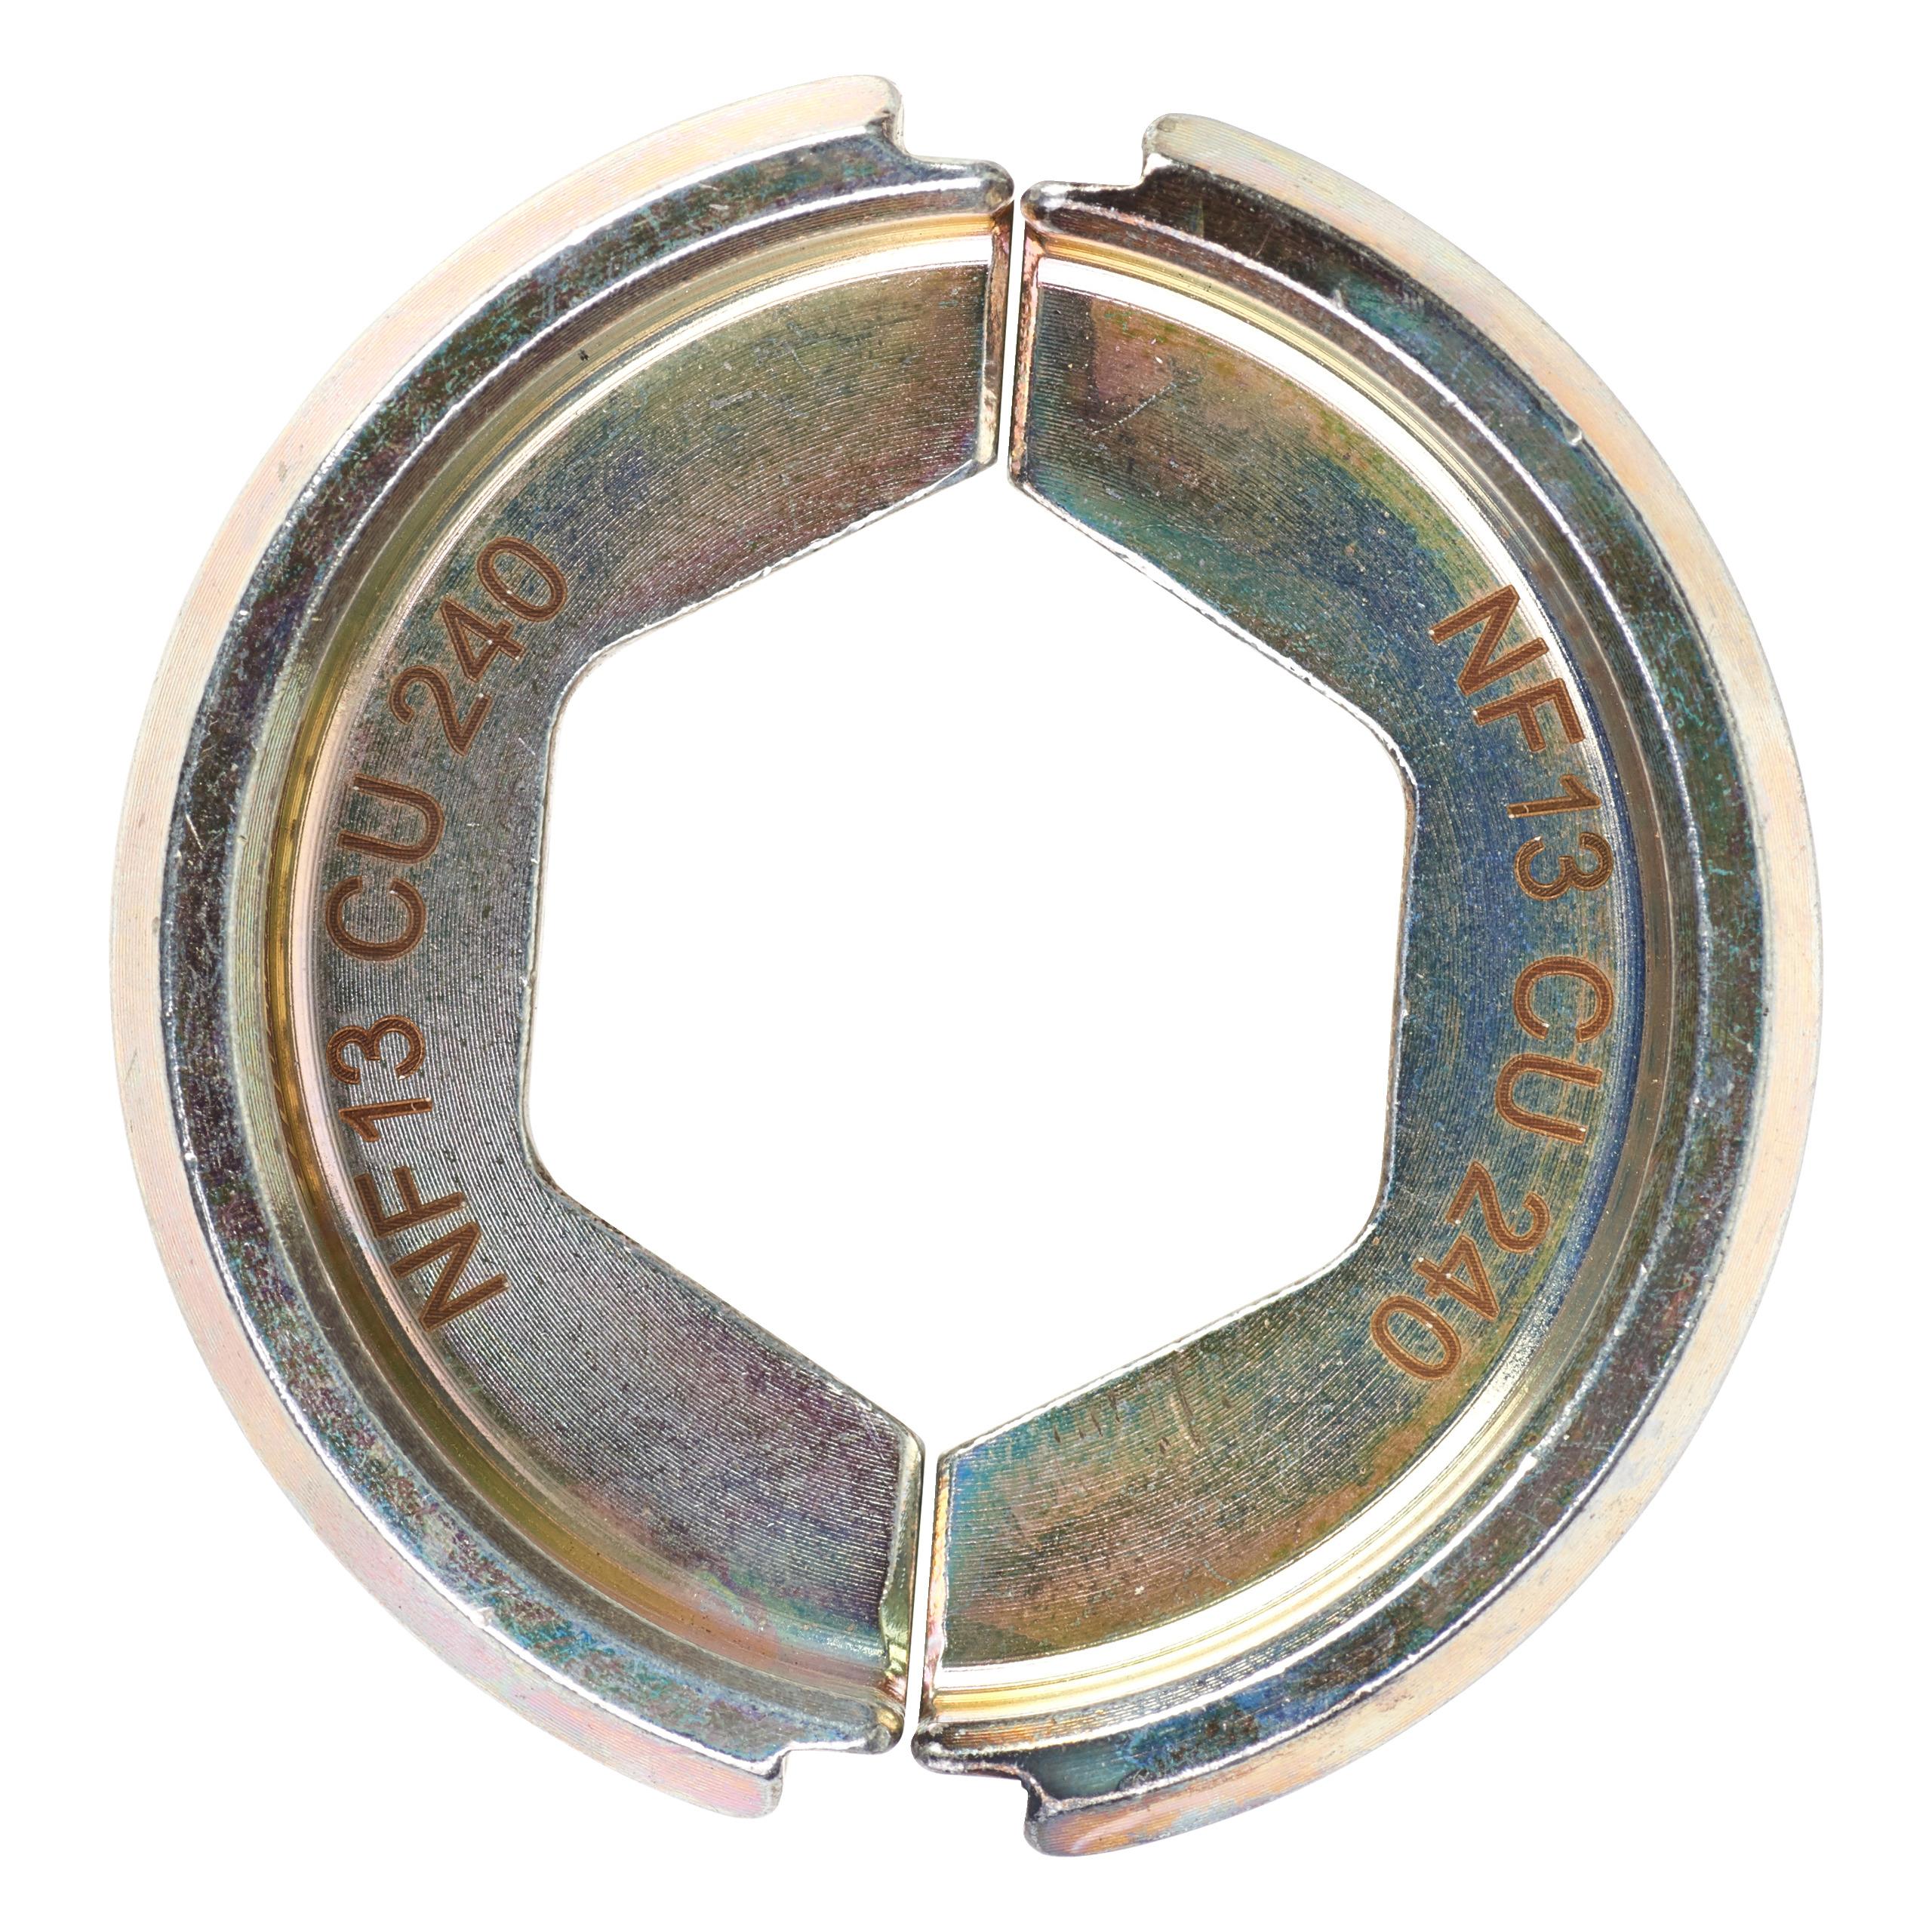 NF13 CU 240-1PC Pojistný kroužek